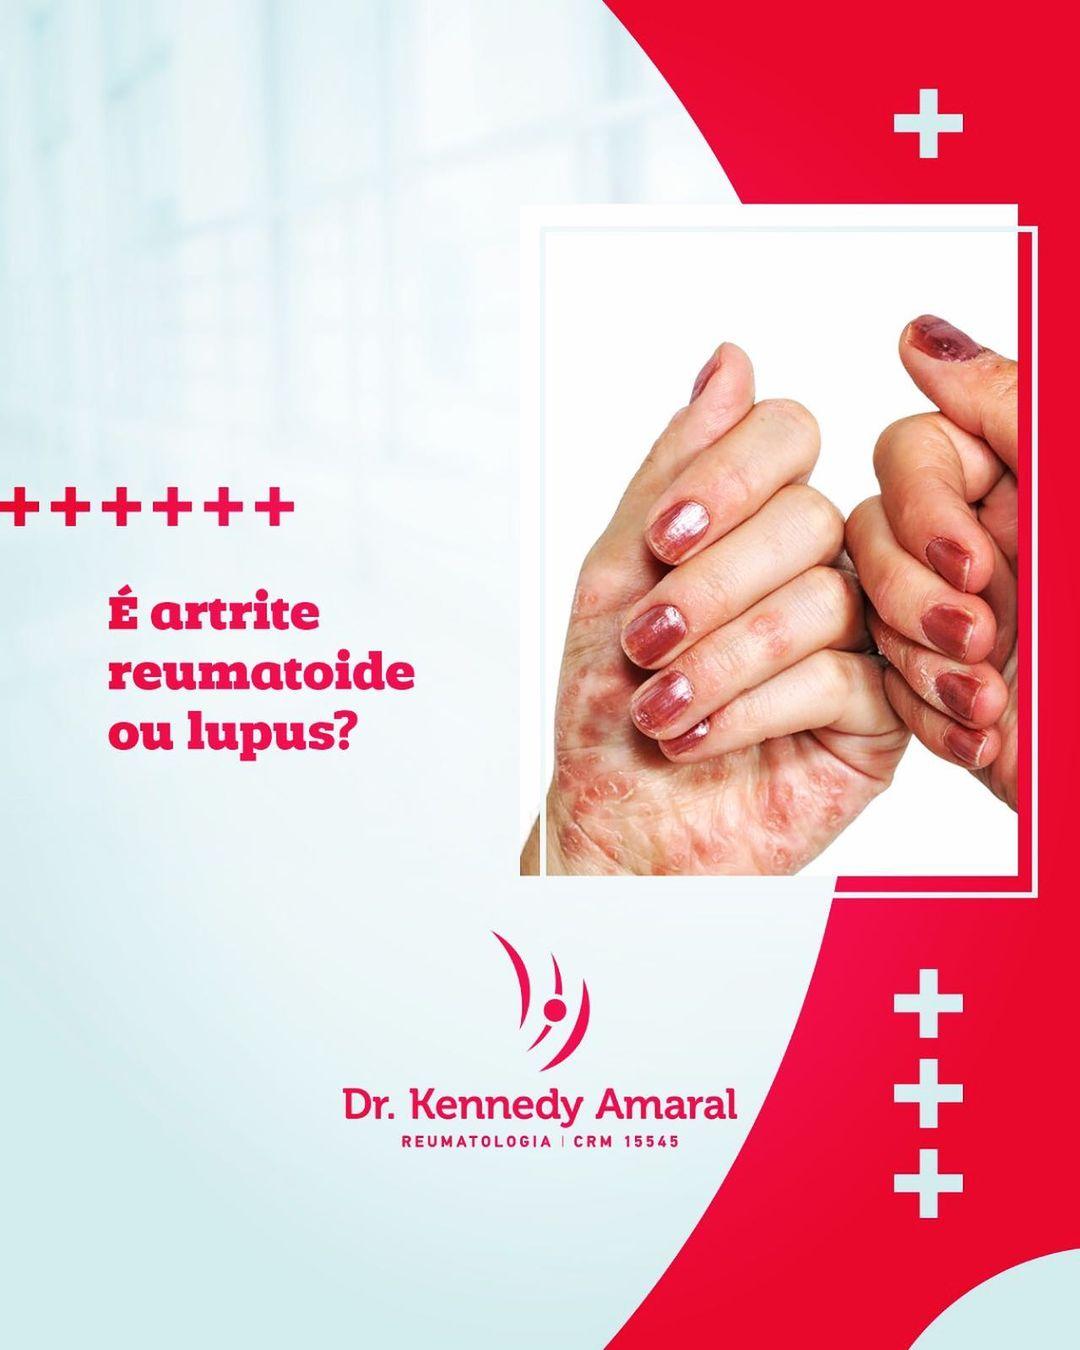 É artrite reumatoide ou lúpus